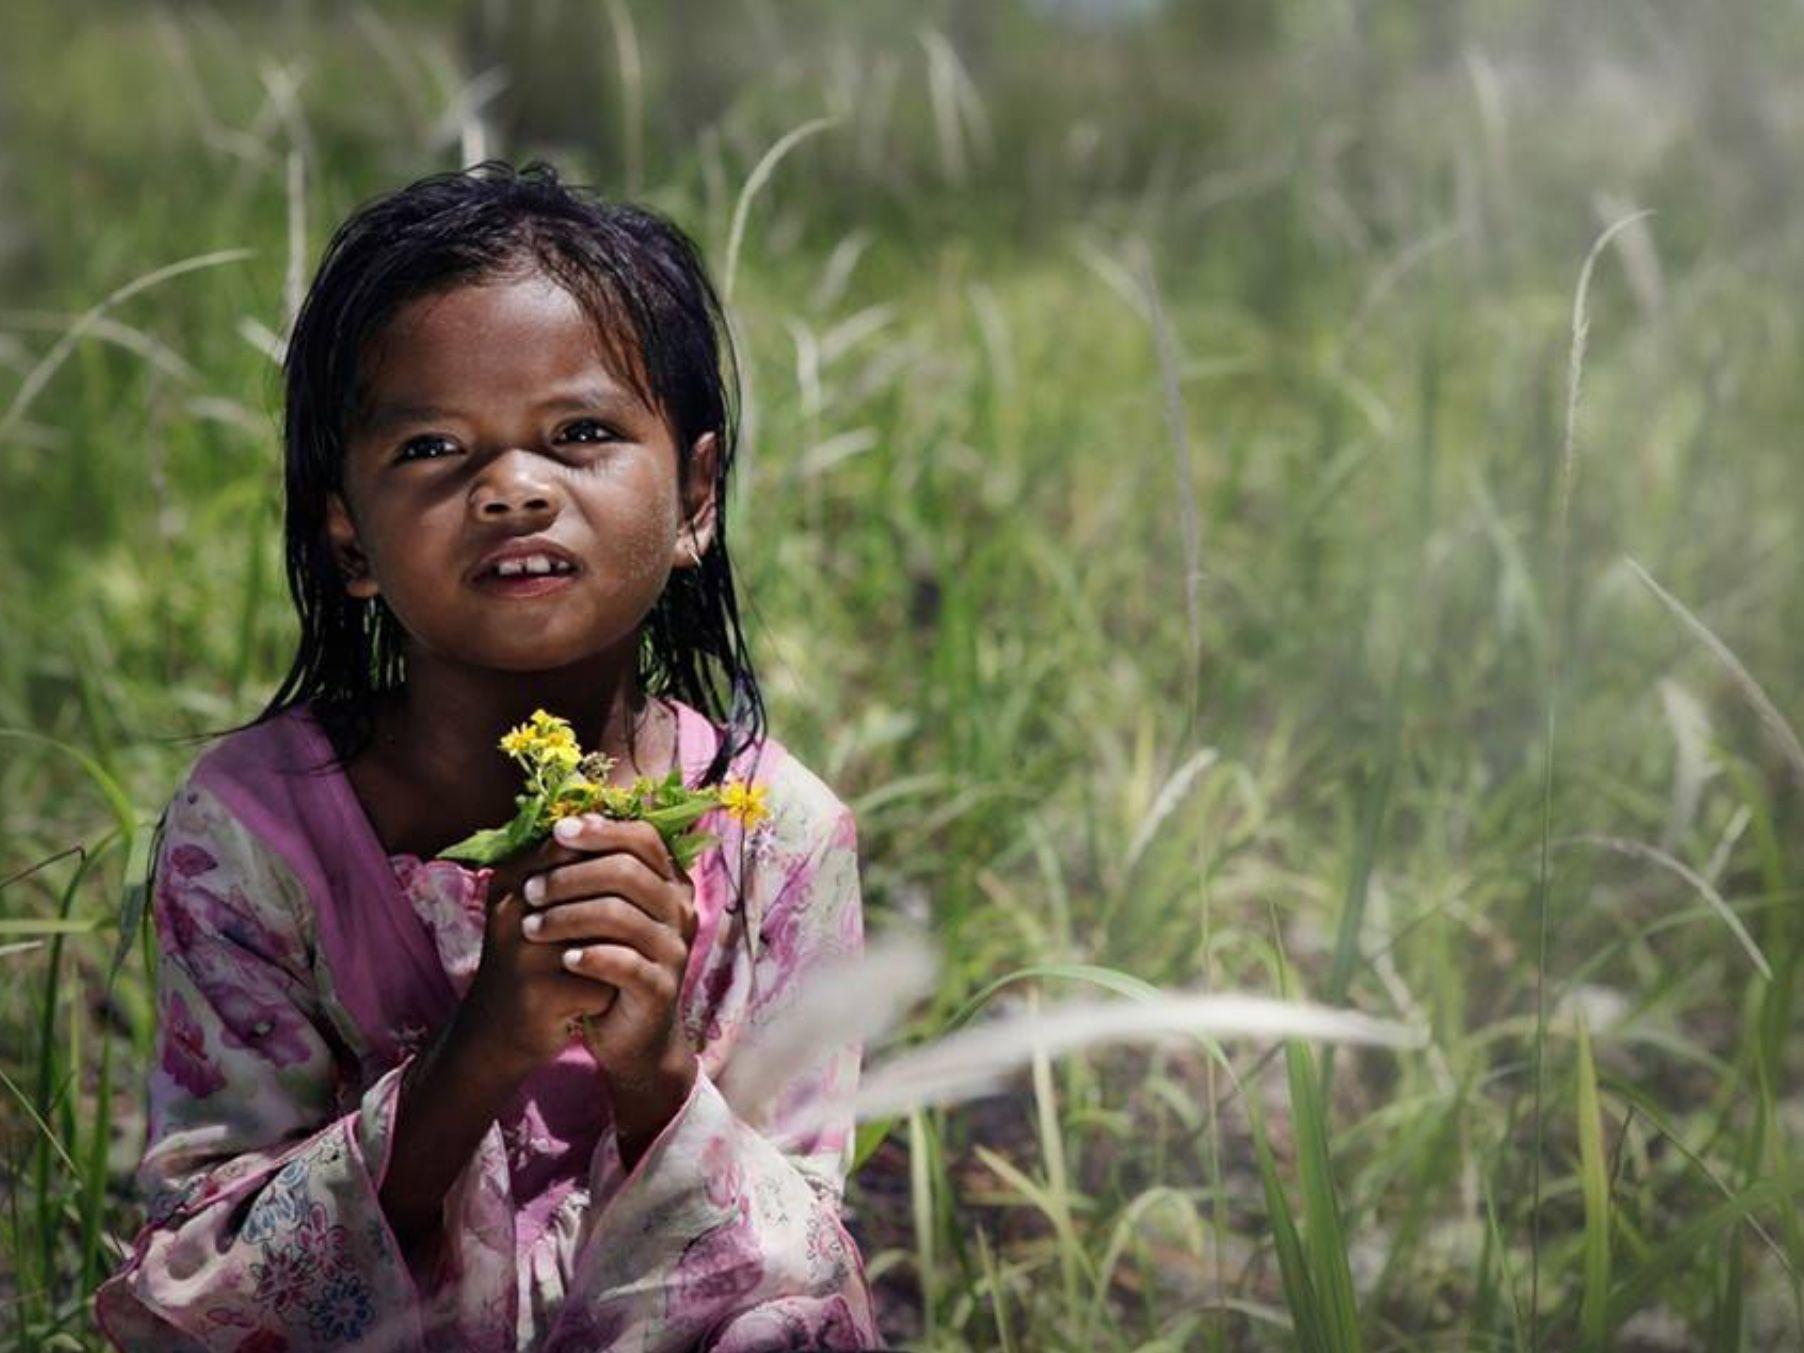 Fotografie Bambini ~ Best ossobello cani e bambini images